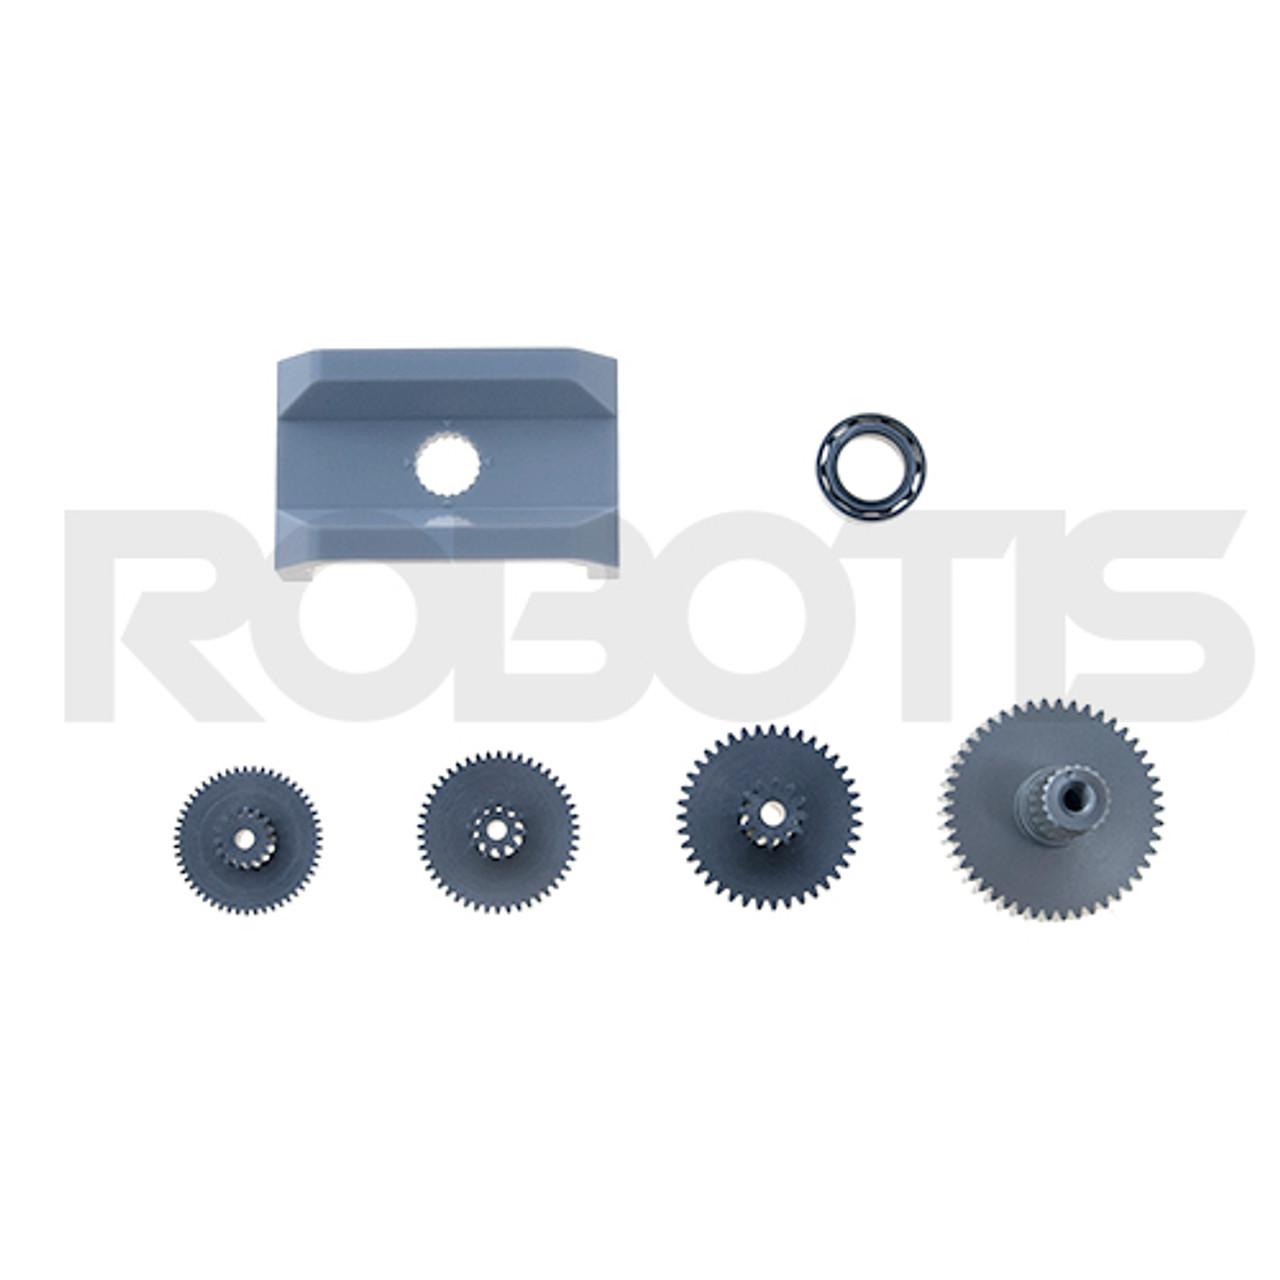 X430-210 Gear/Bearing Set